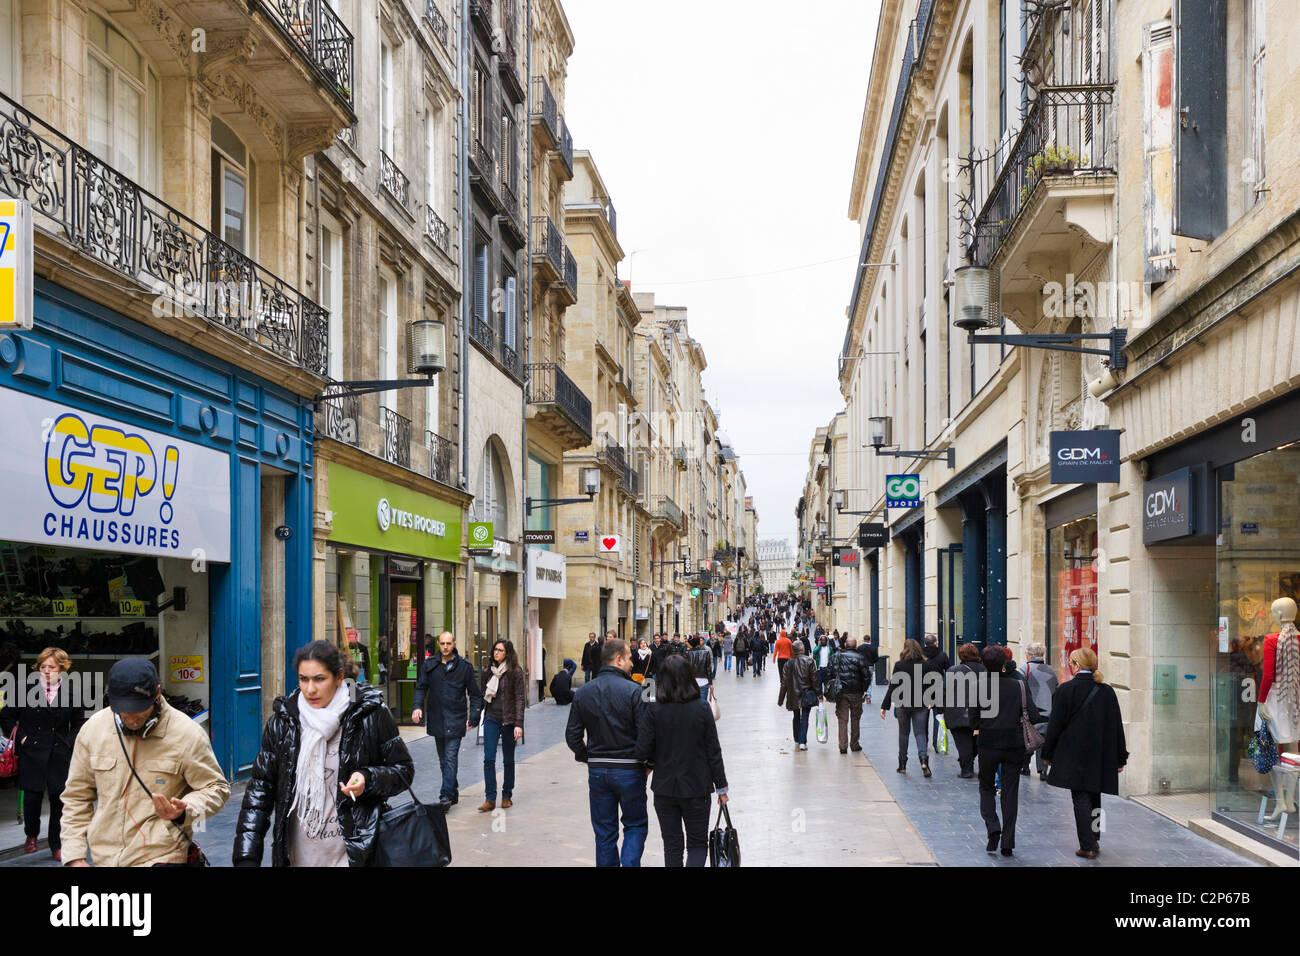 Shops on Rue Ste Catherine in the city centre, Quartier St Pierre, Bordeaux, Aquitaine, France - Stock Image